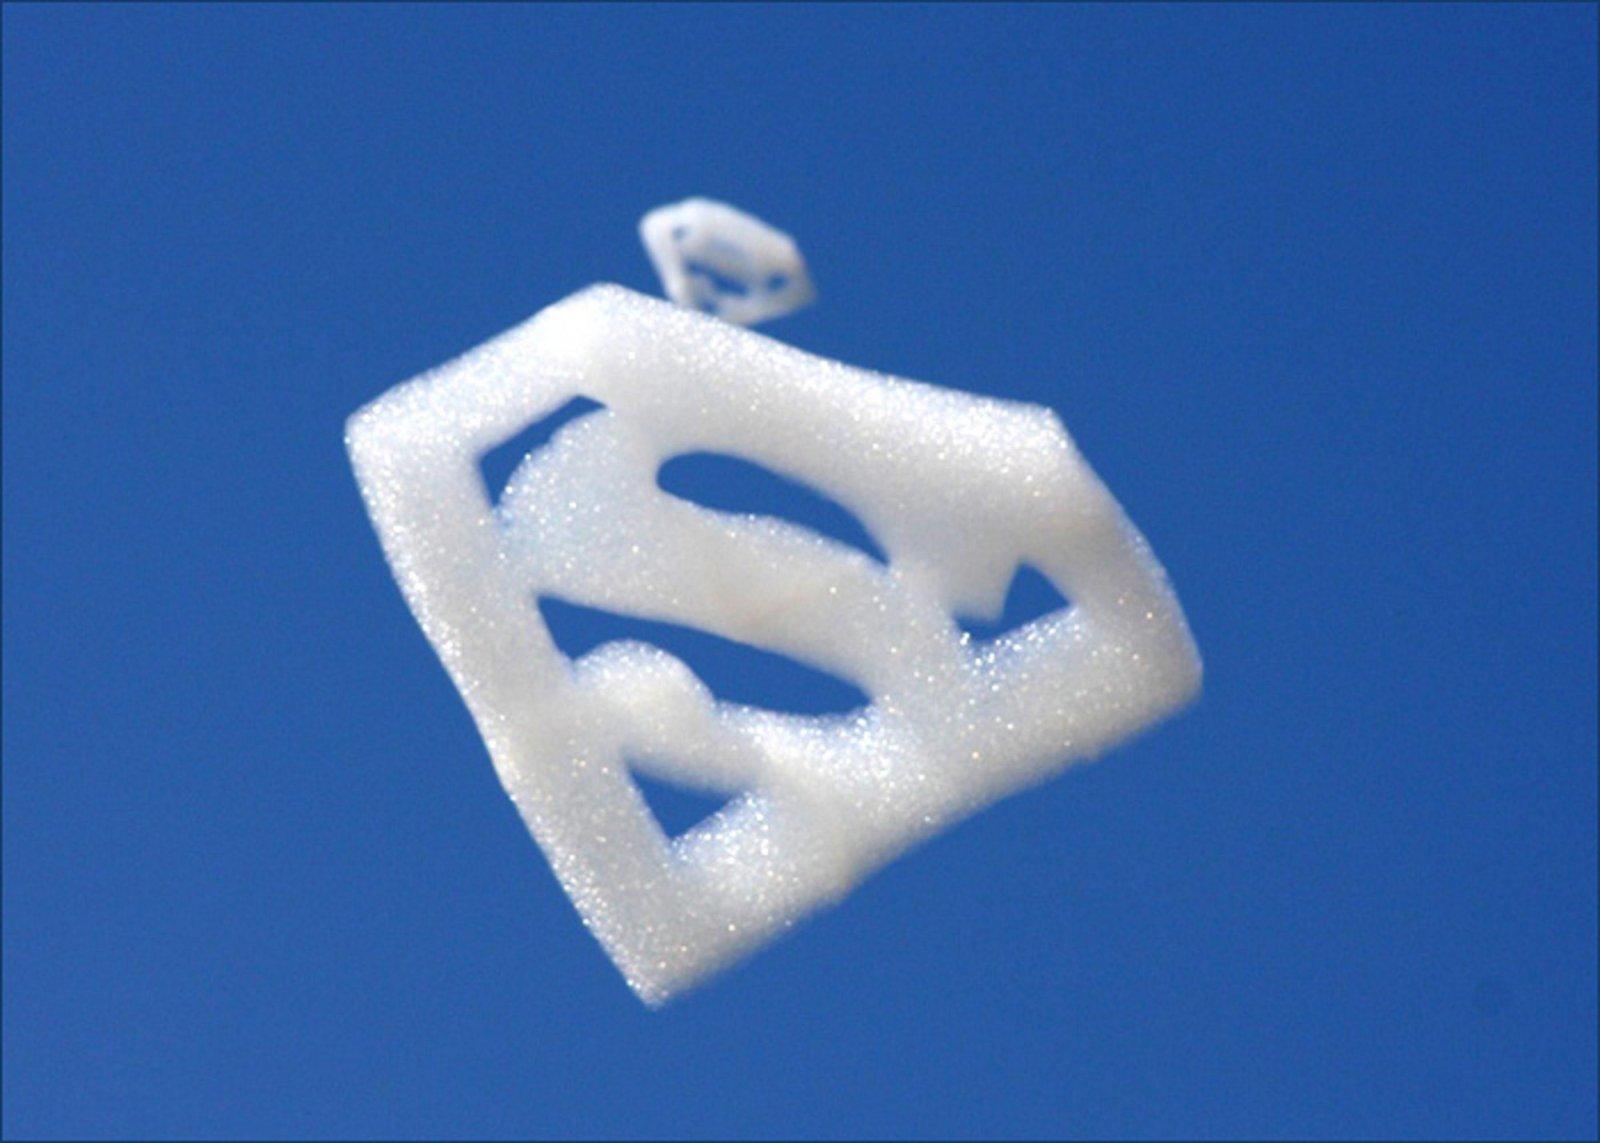 Flogos-Floating-Foam-Advertising-Clouds-Superman-Logo.jpg